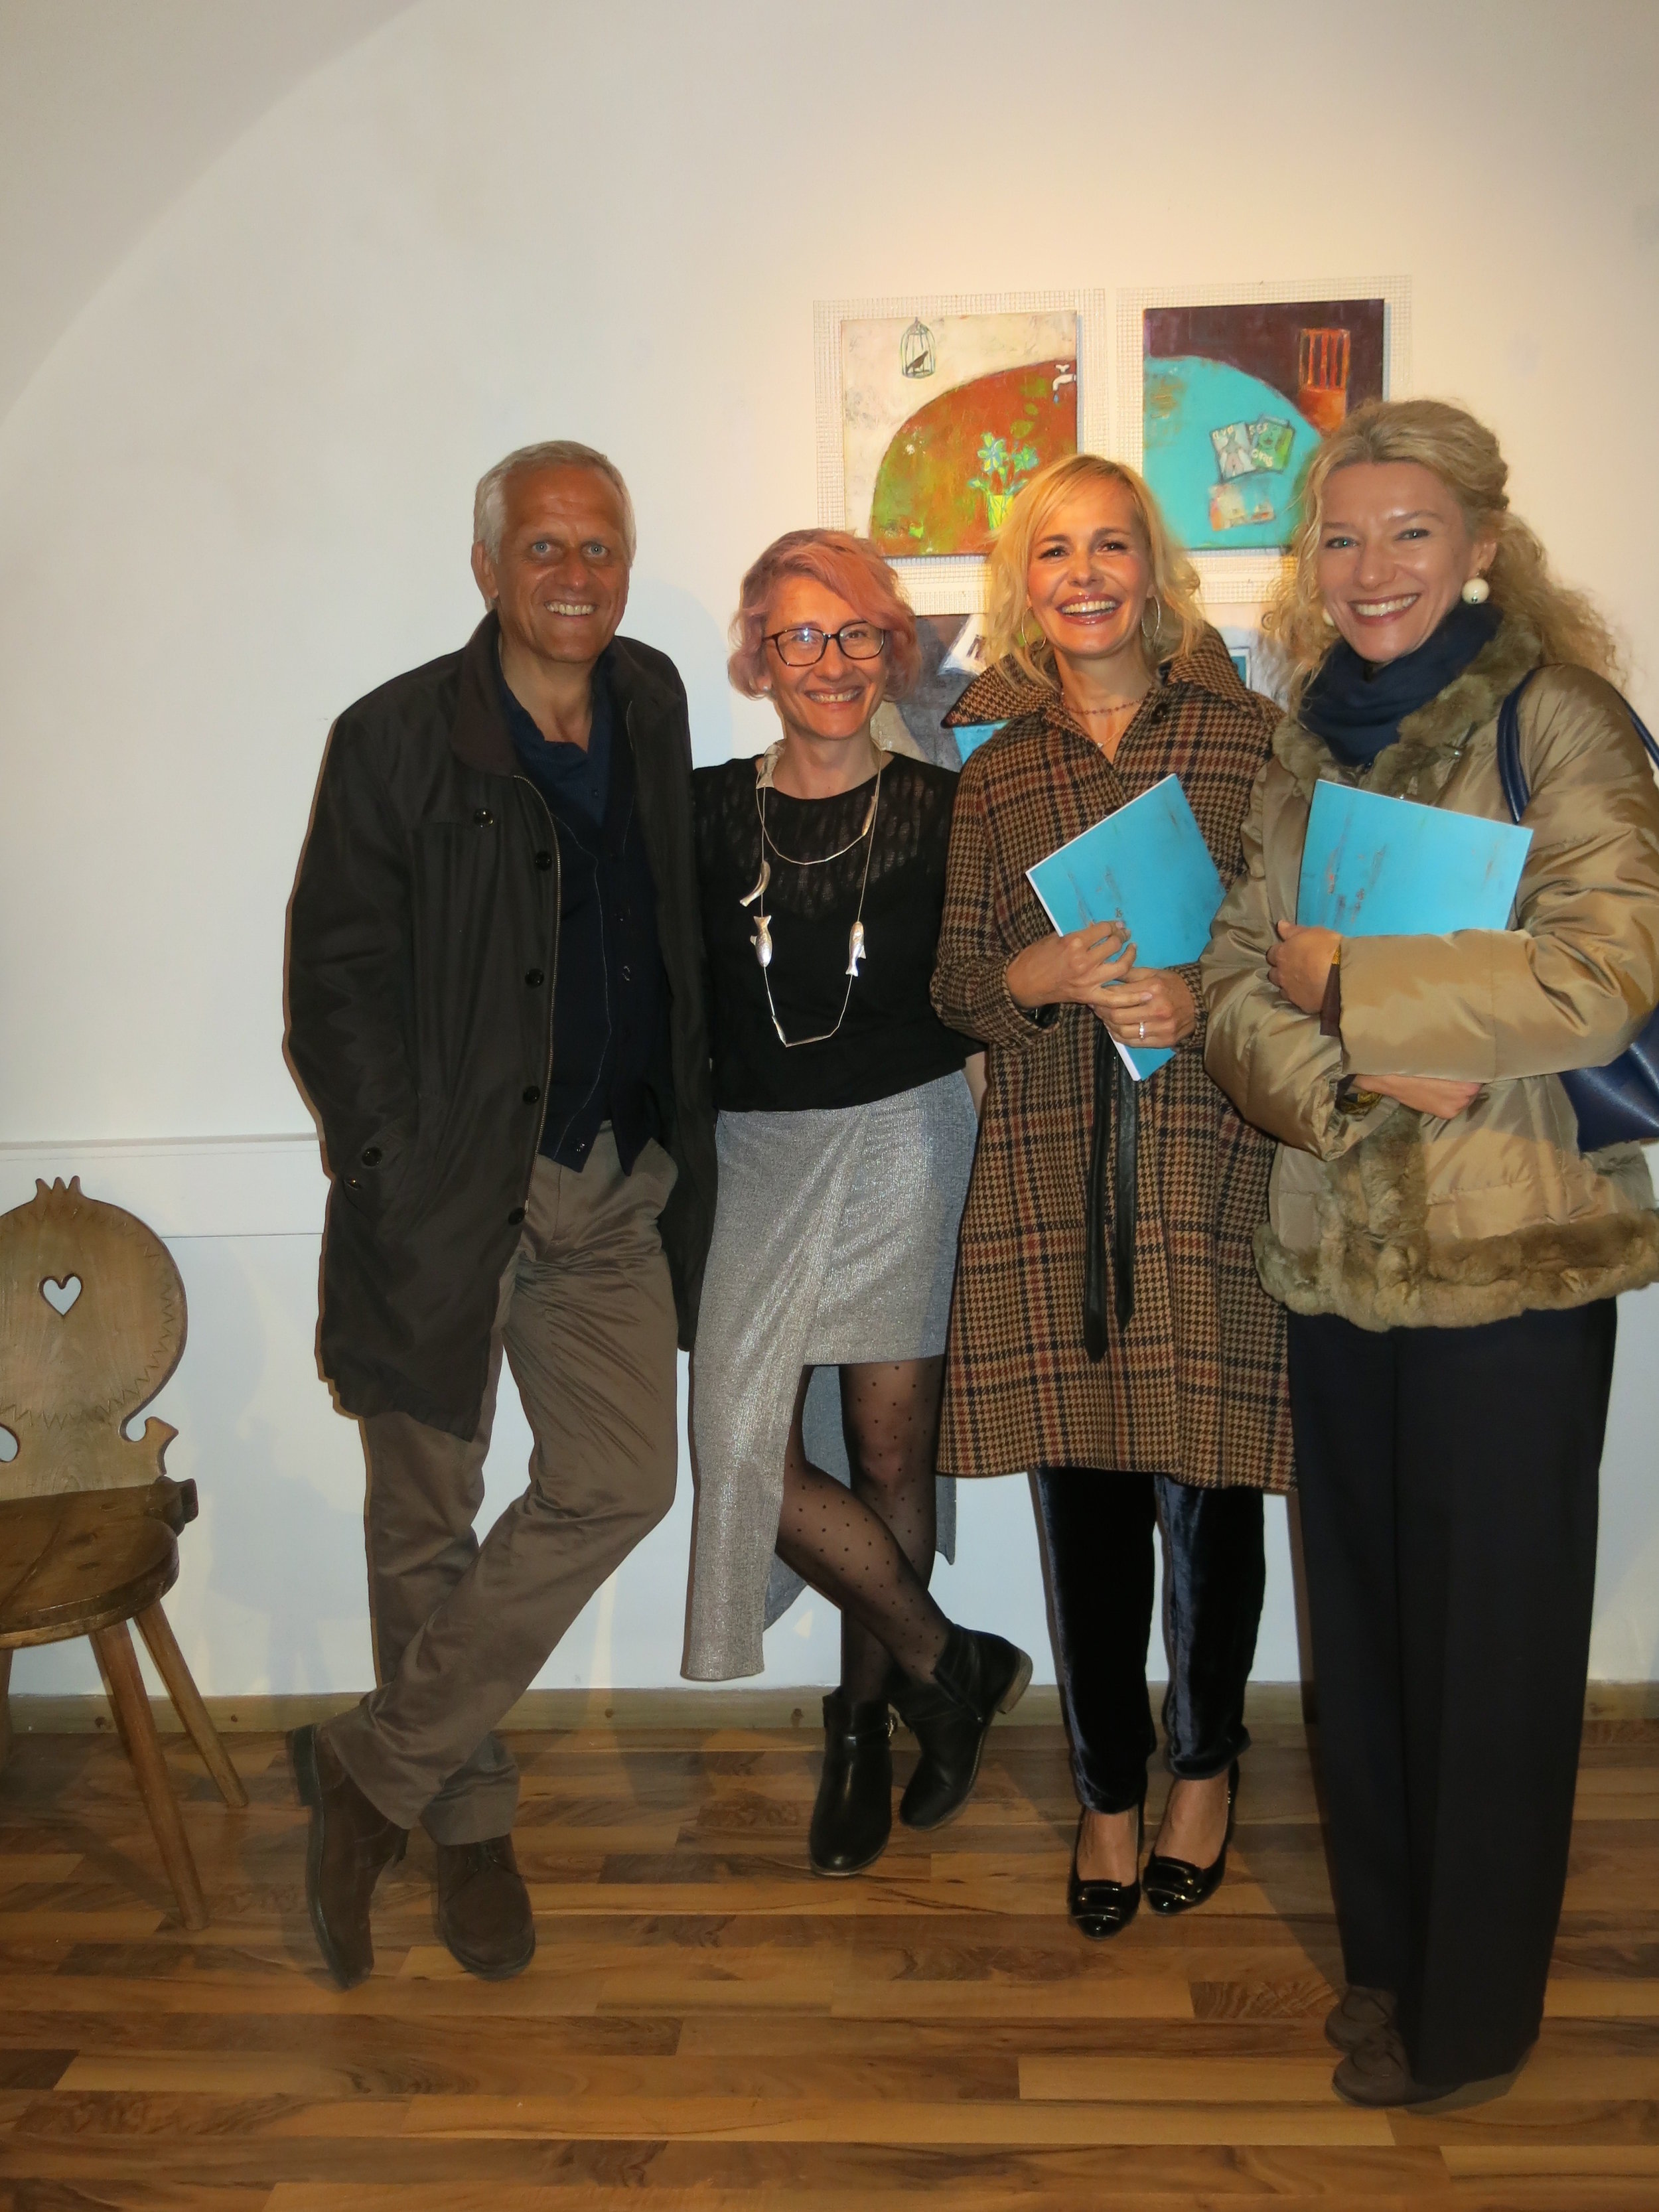 Zeno Kerschbaumer, Karolina Gacke, Barbara Faller, Barbara Cuscina